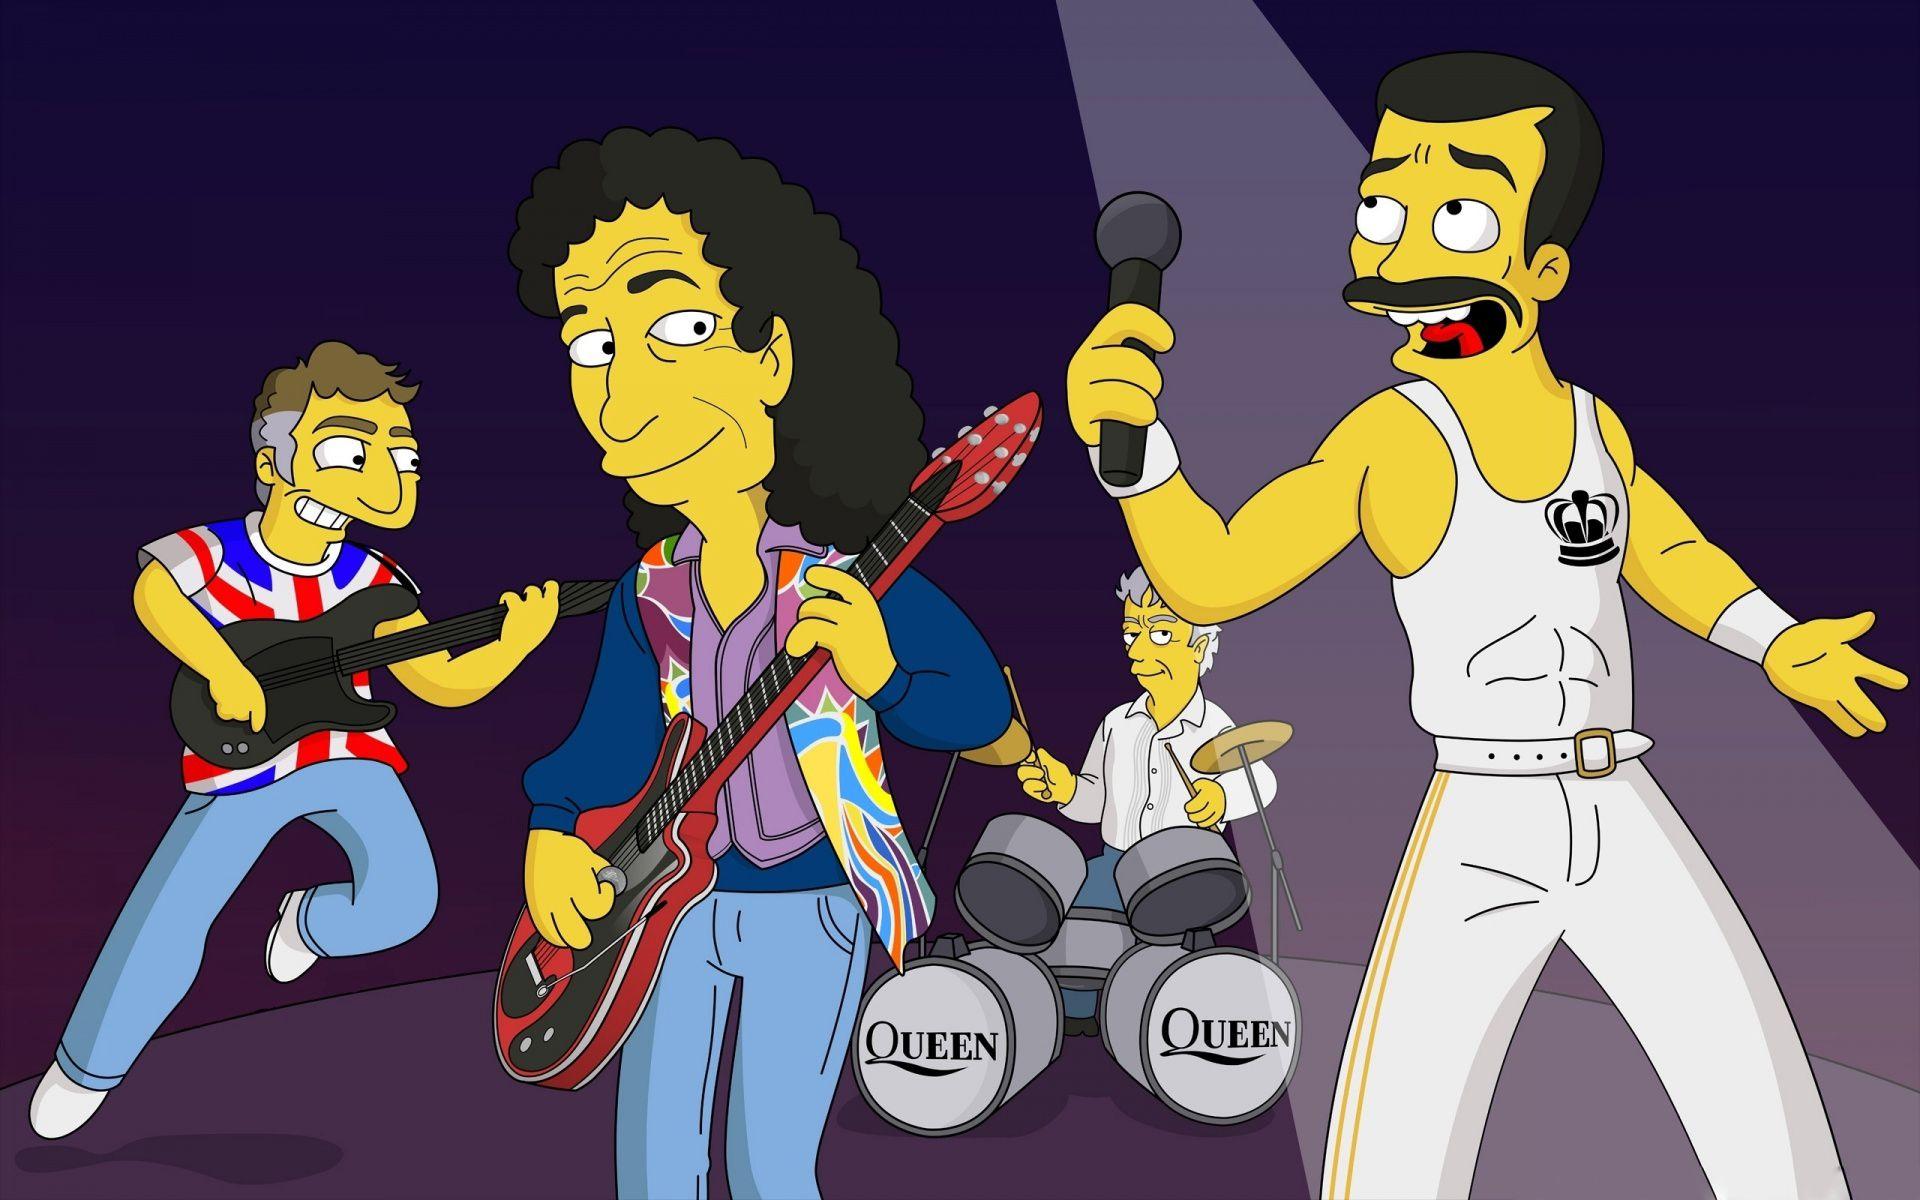 #pianosoftware The Simpsons Music